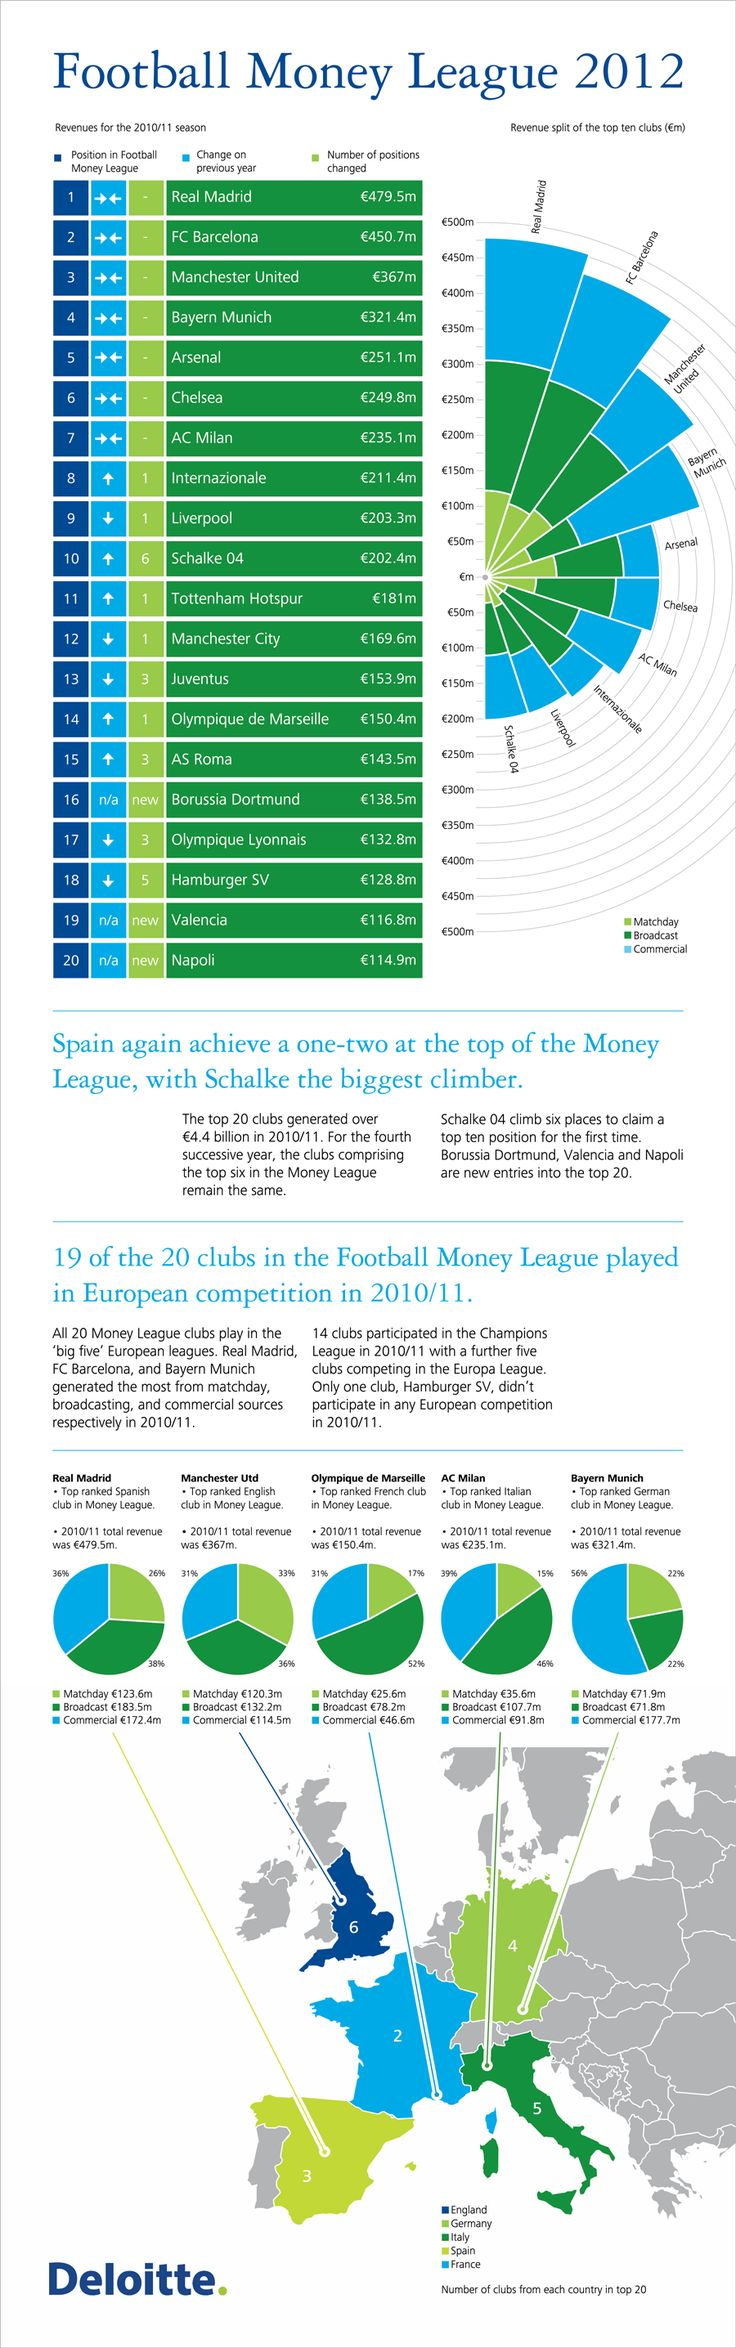 Deloitte Football Money League 2012